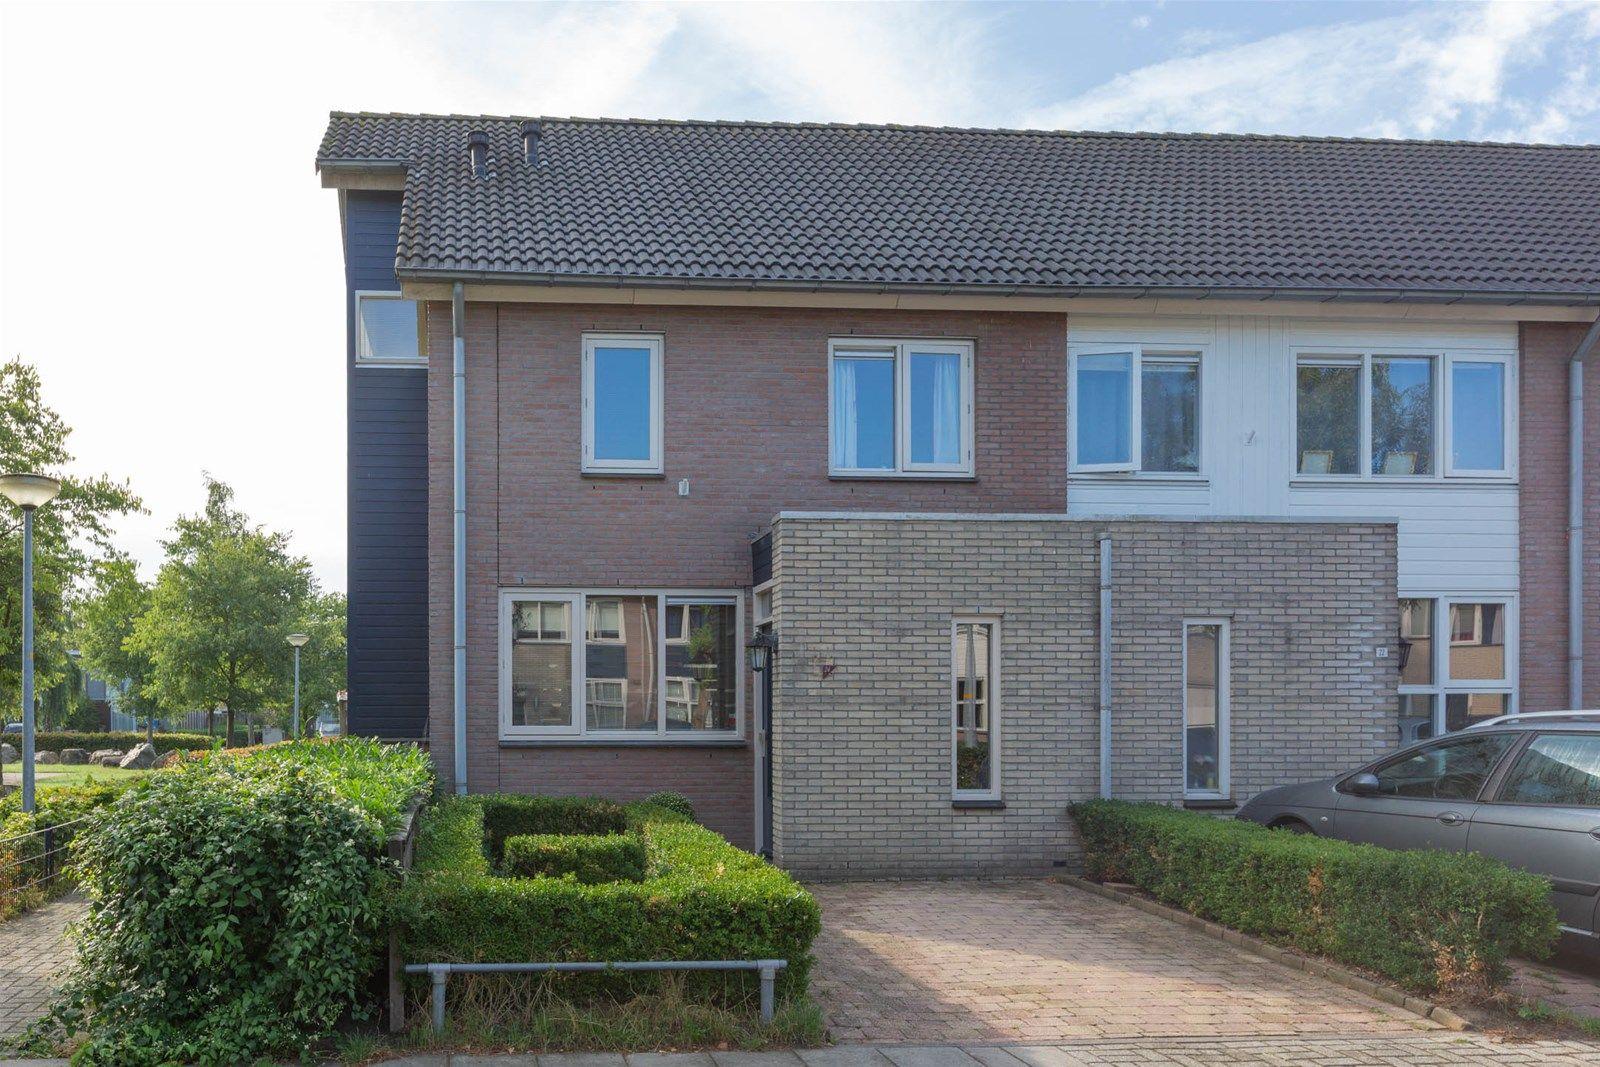 Paulus Potterstraat 24, Almere